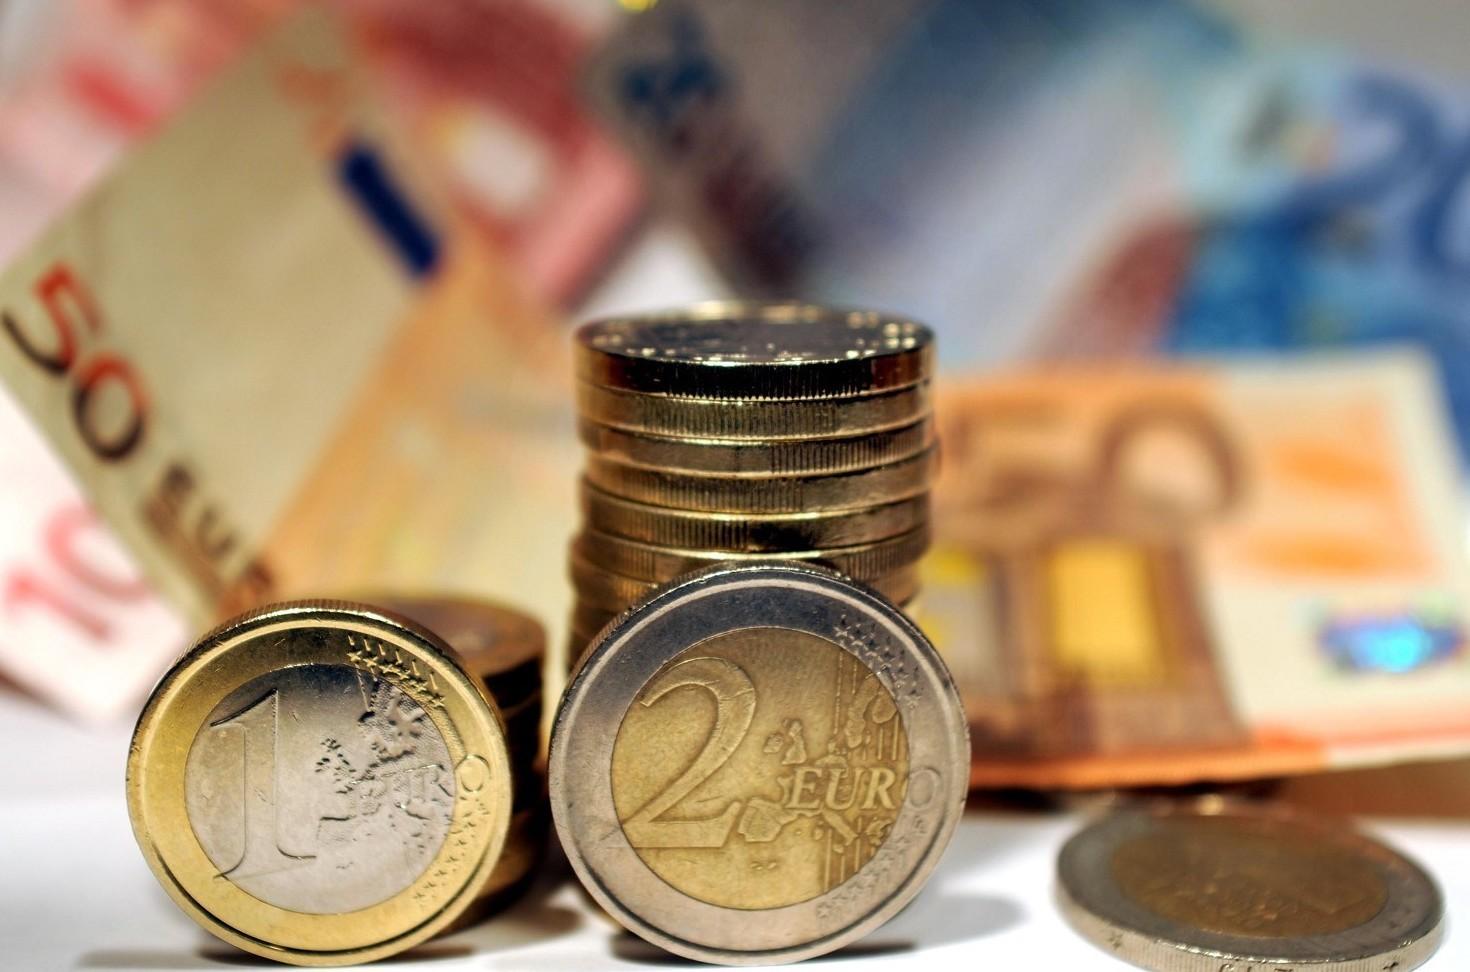 Pensioni ultime notizie: benefici da rid